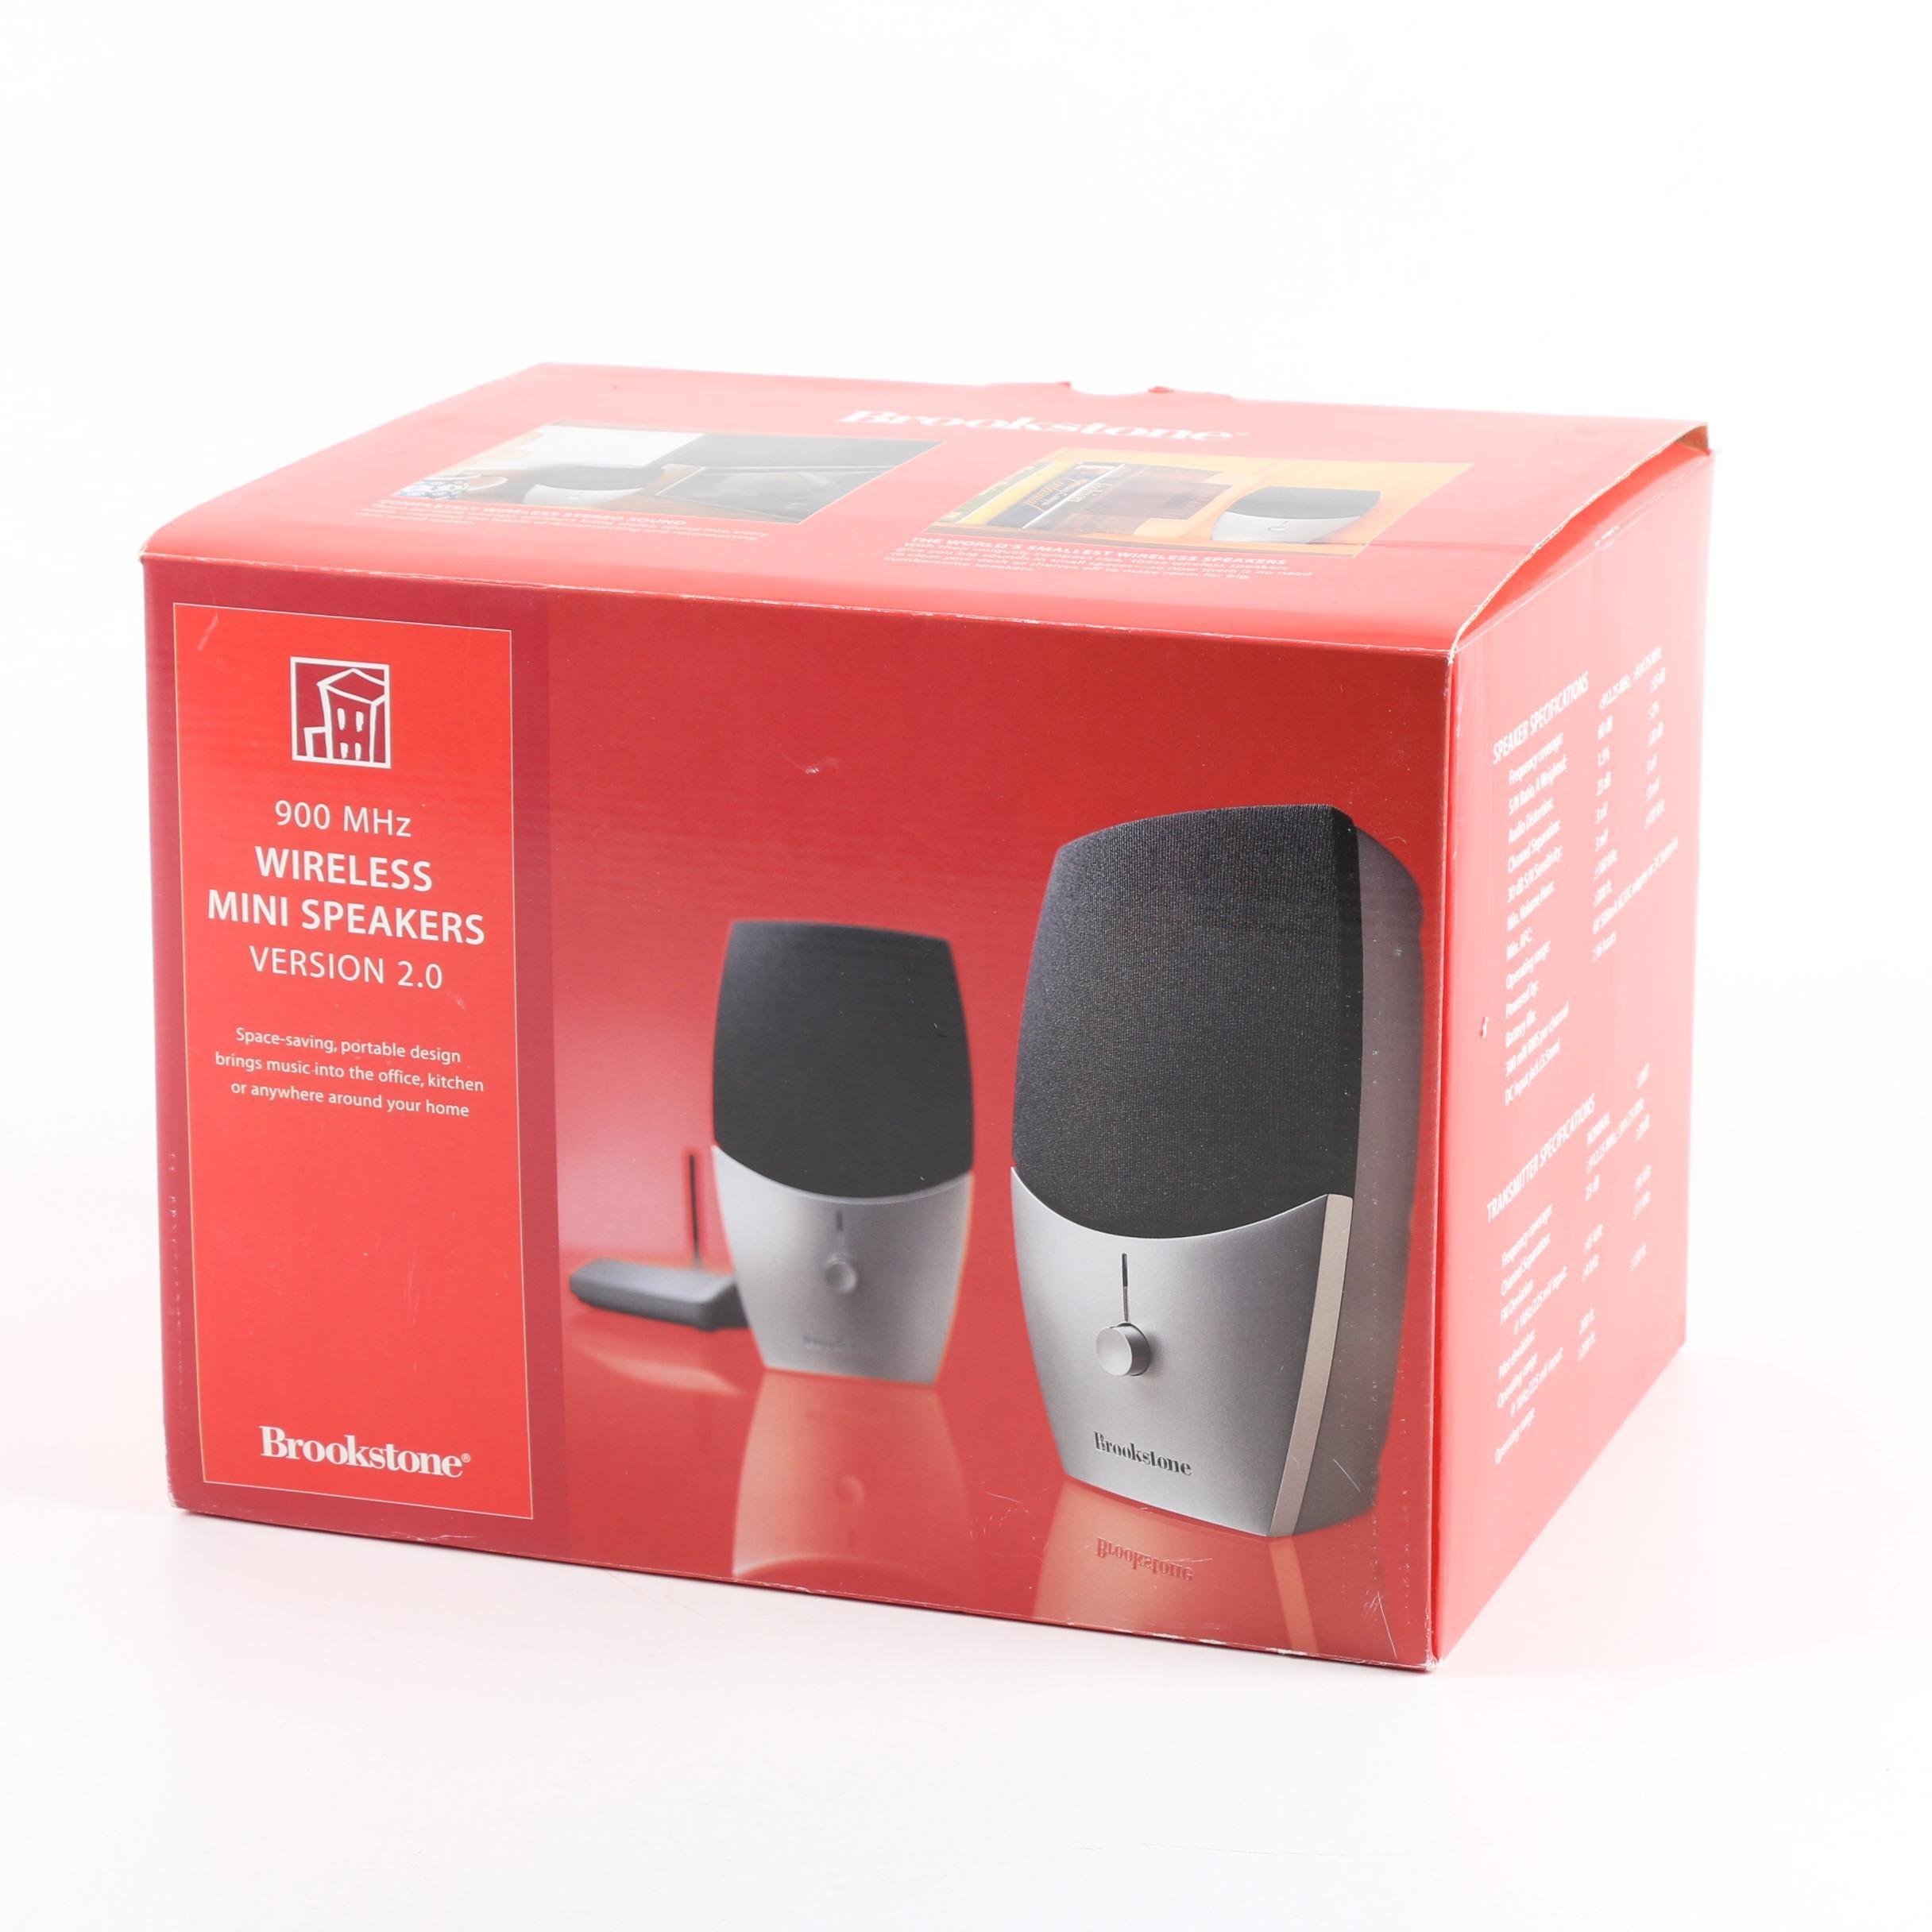 Brookstone Wireless Mini Speakers